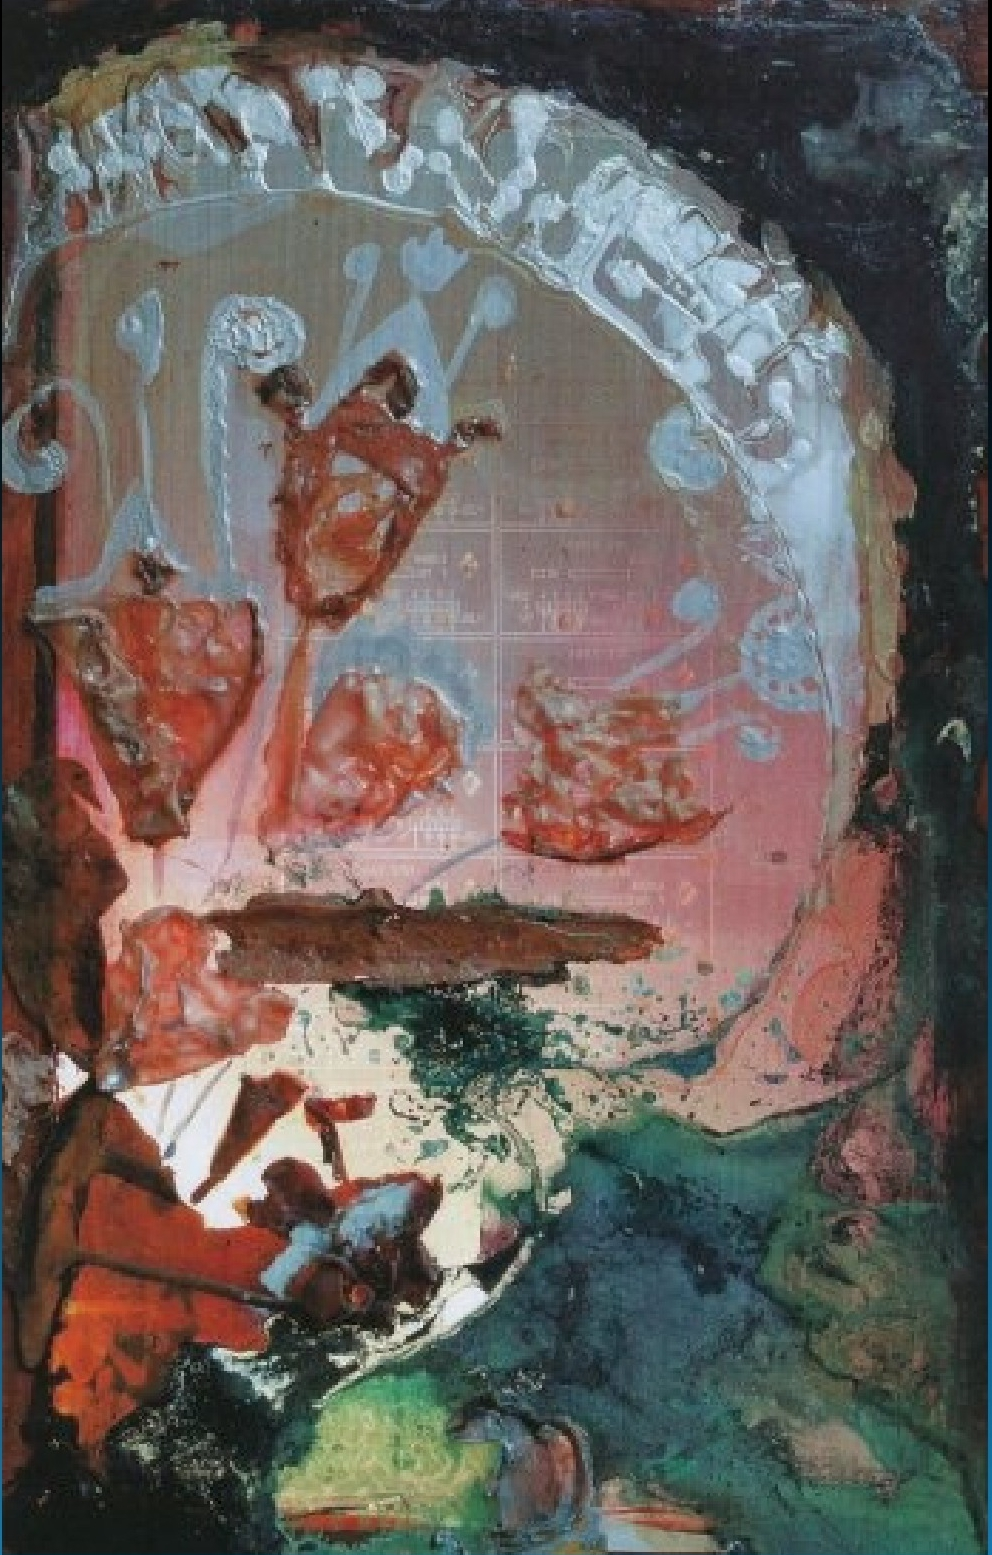 """Кристални Цветя "" Живопис Светлинен Панел Румянка Божкова"